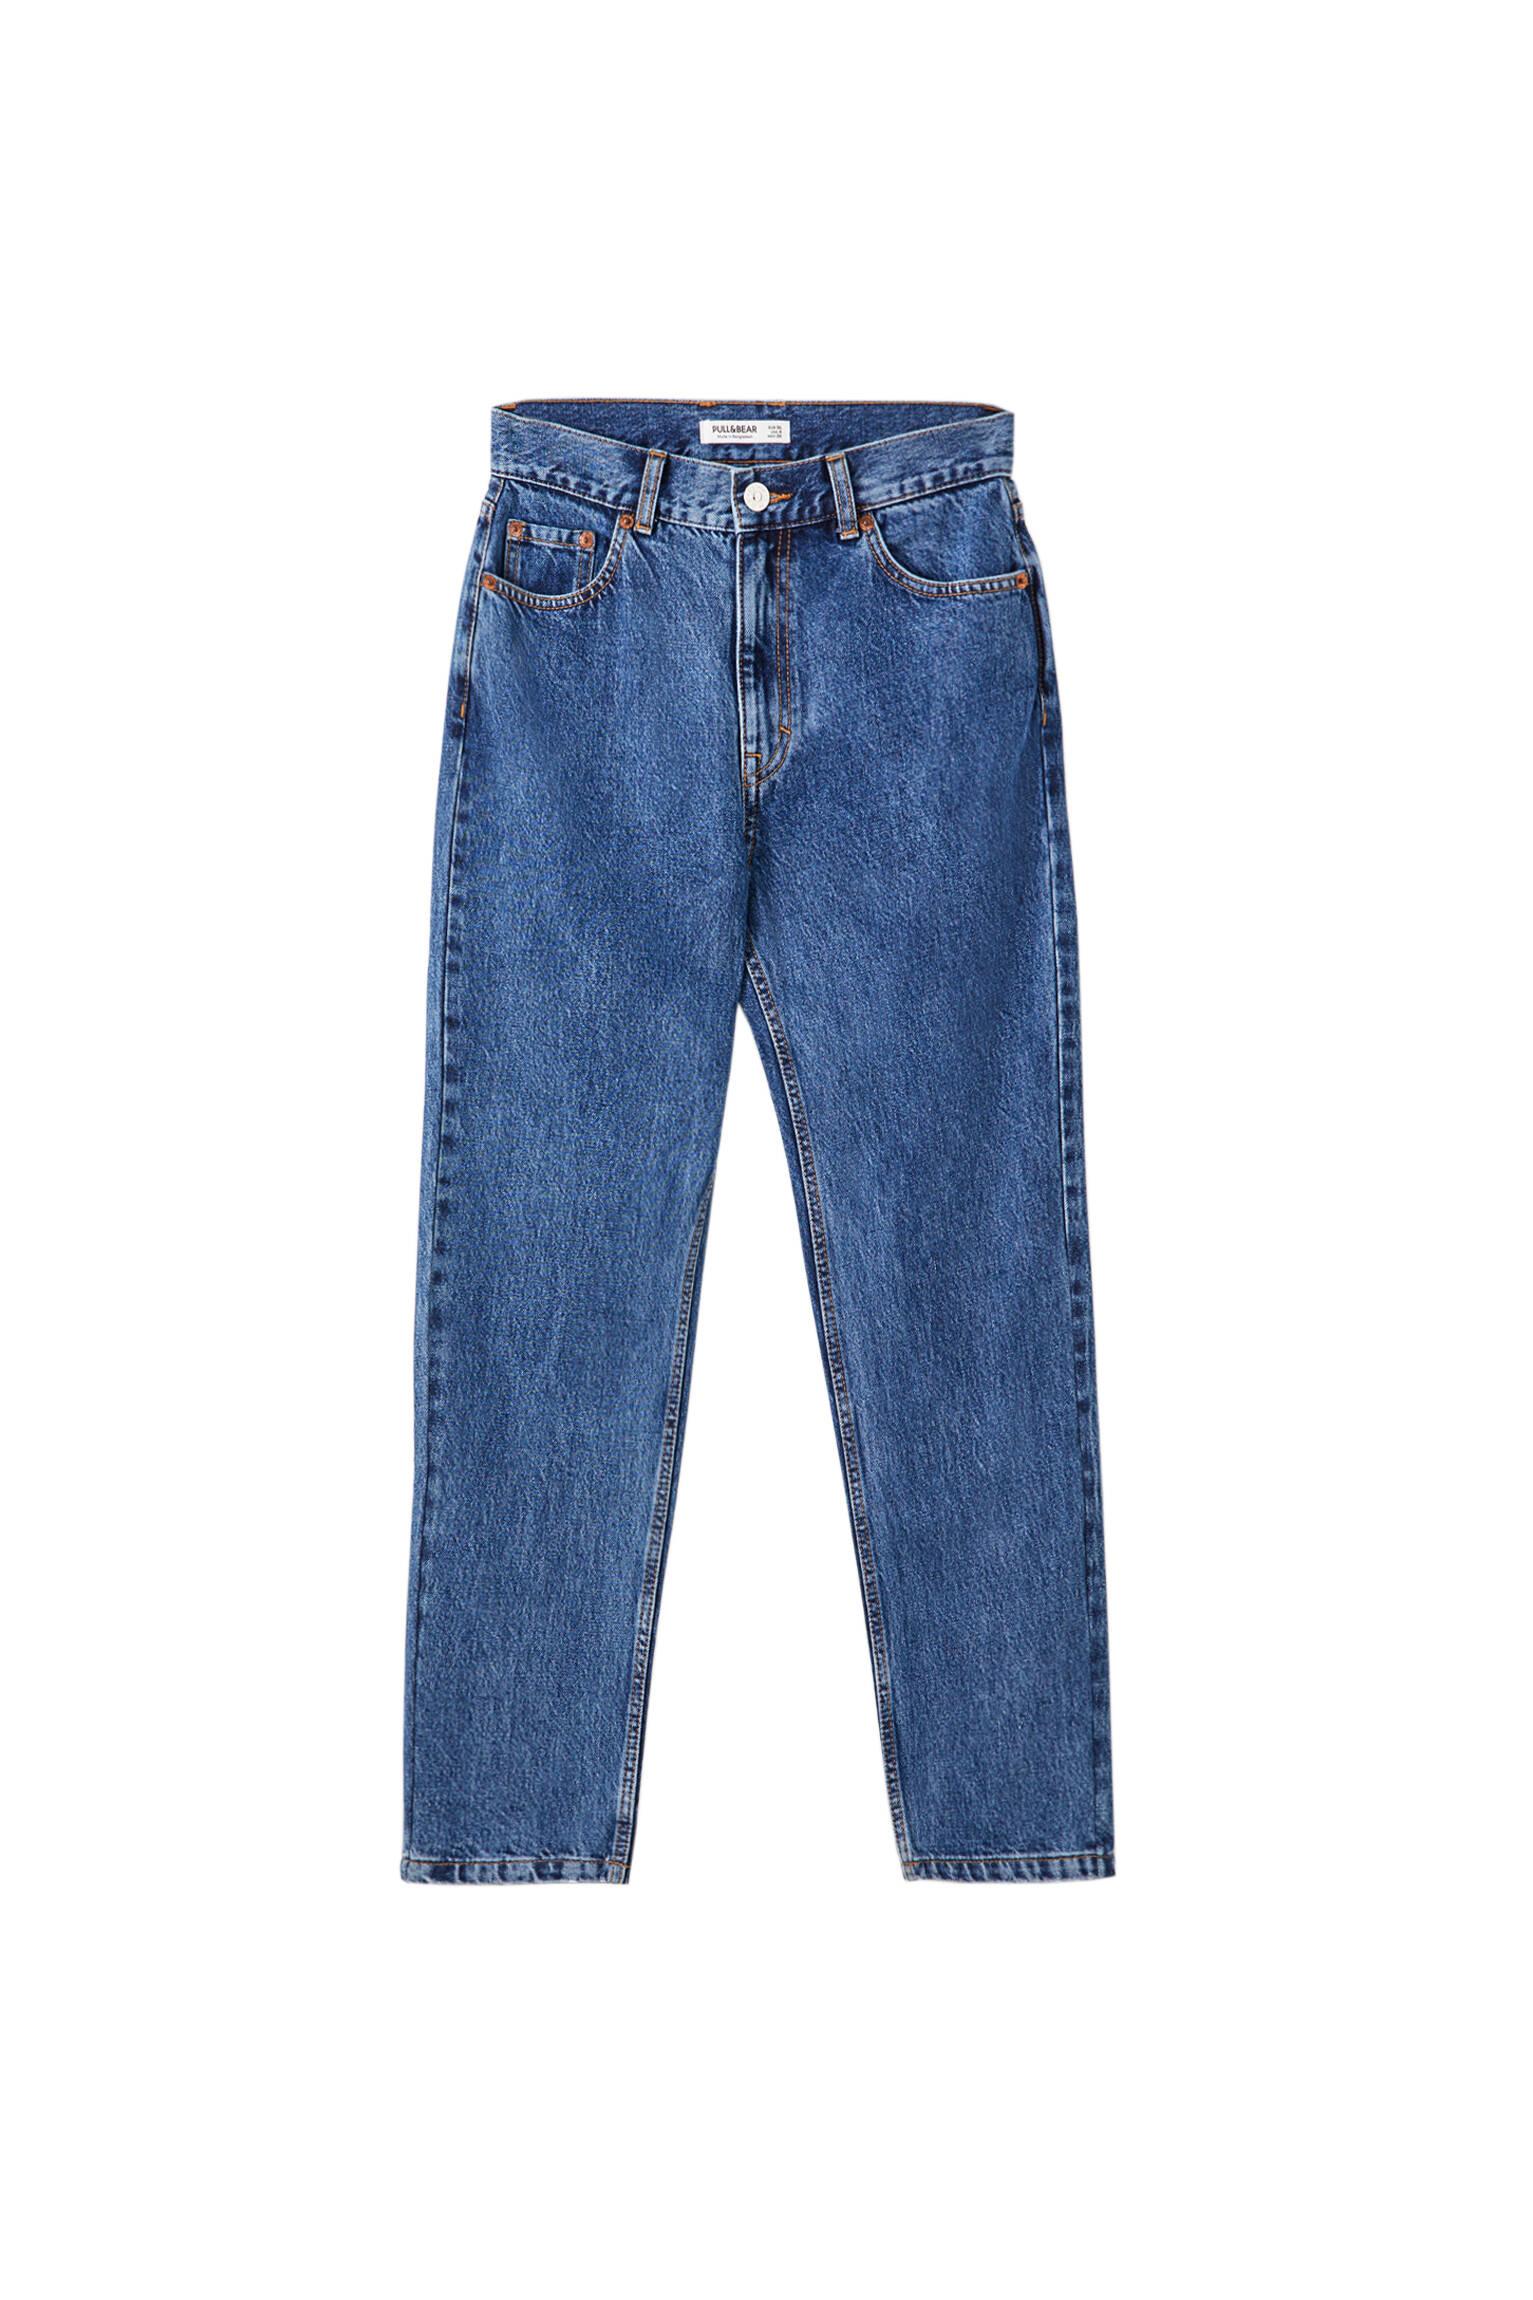 Синий Базовые джинсы mom fit Pull & Bear